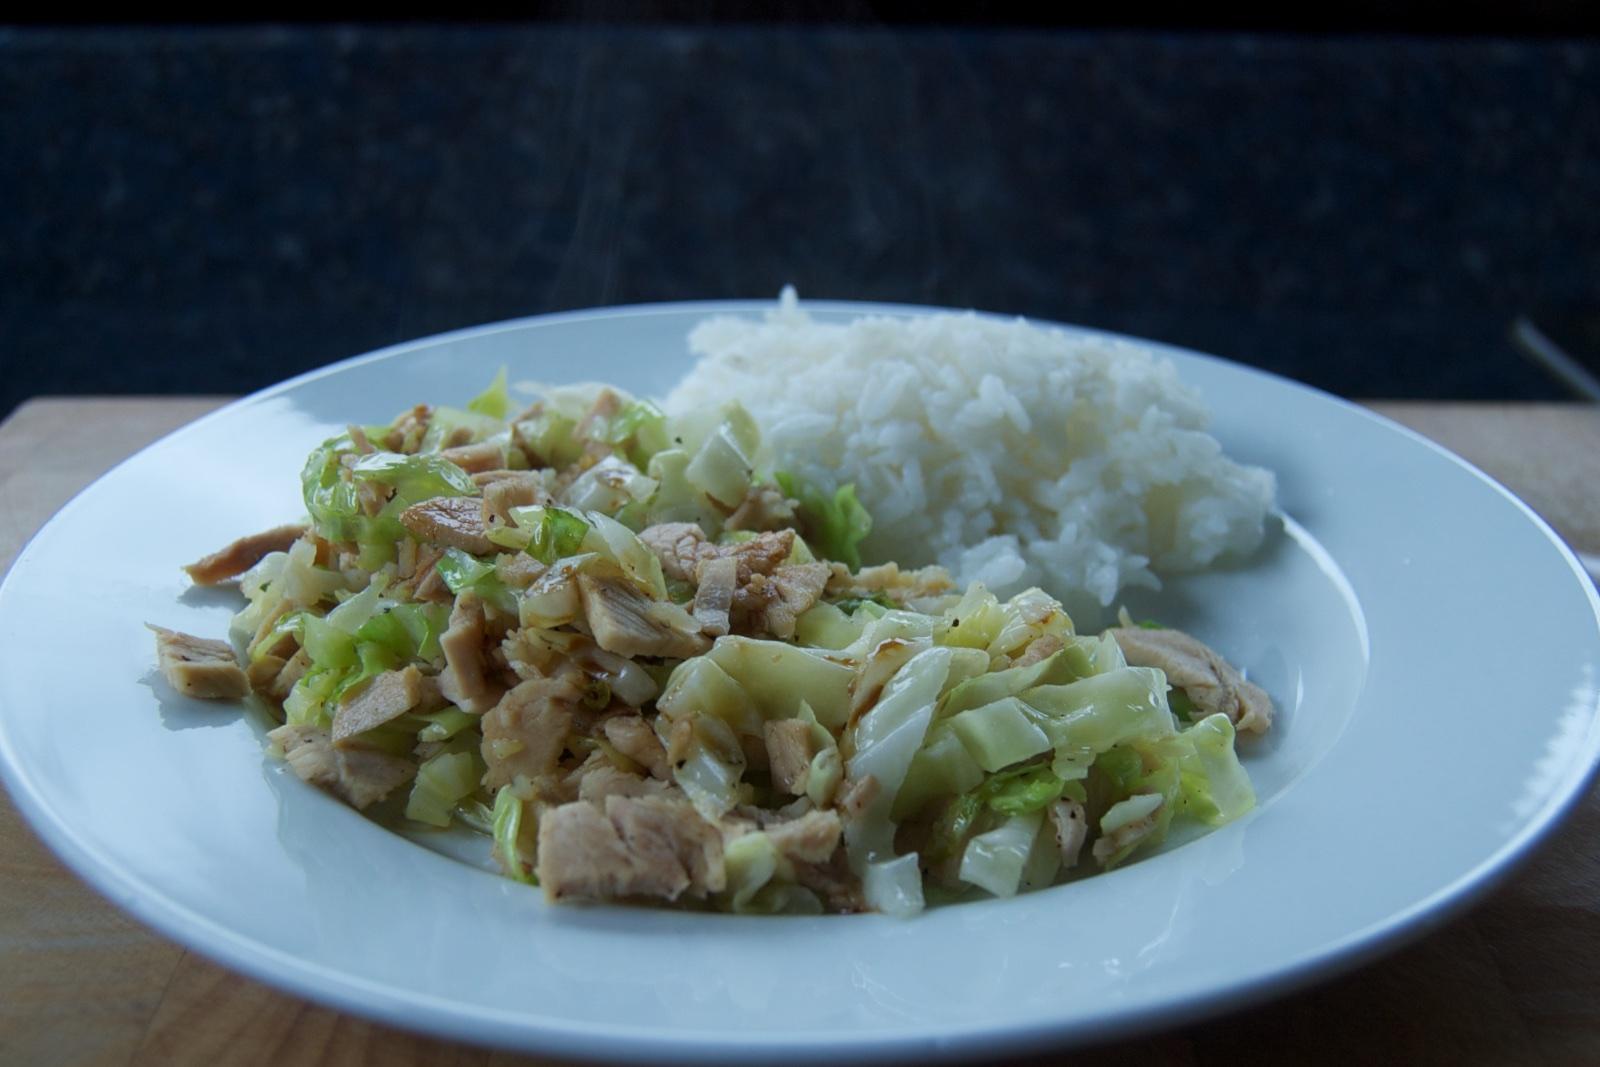 http://blog.rickk.com/food/2014/11/12/ate.2014.11.12.l.jpg